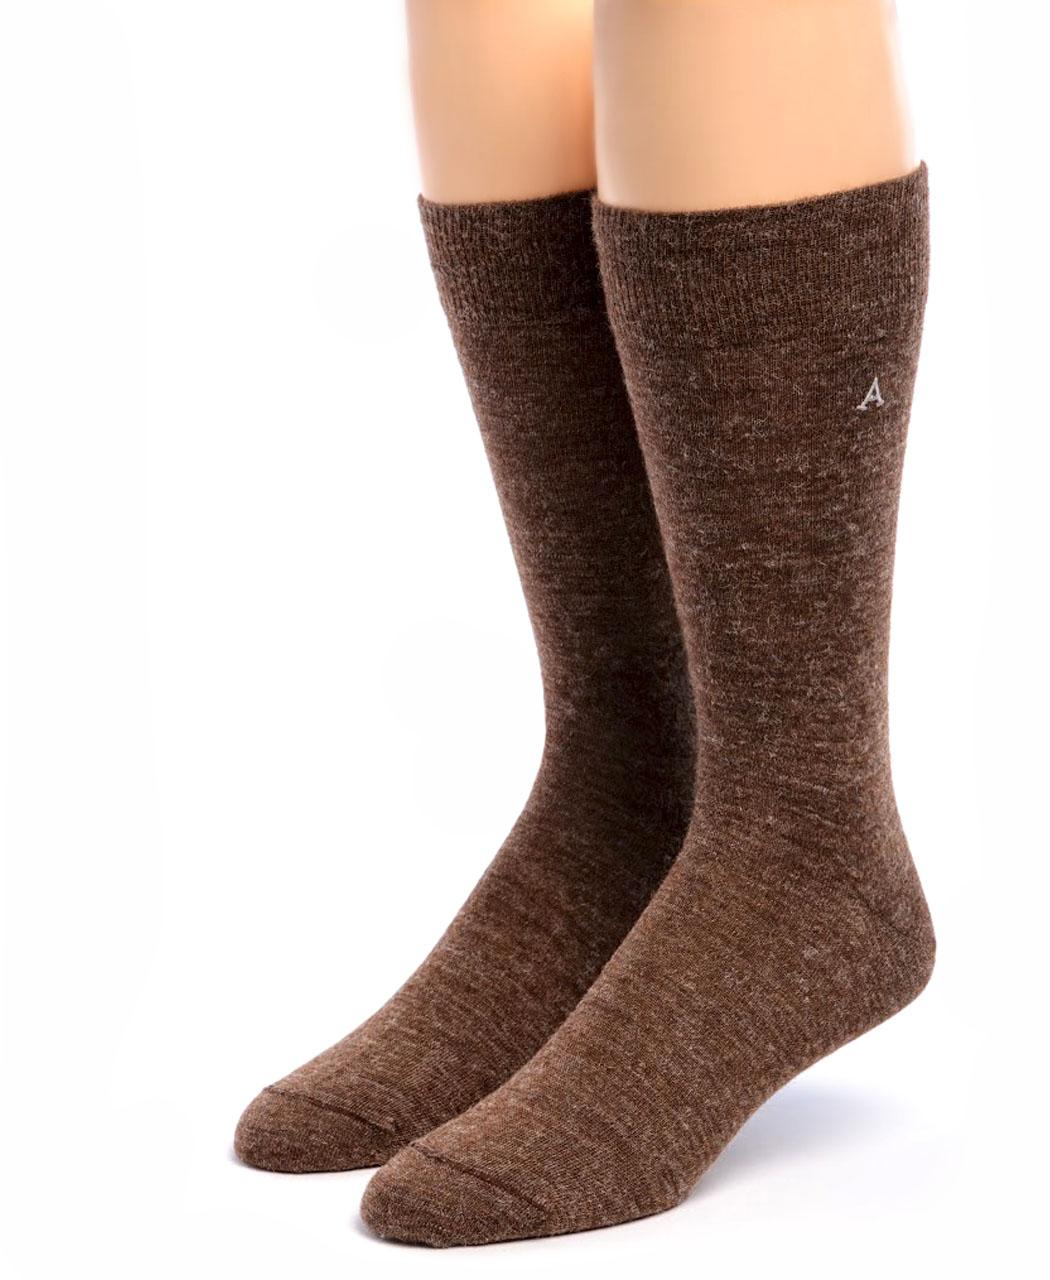 e7b083b0ab054 Alpaca Socks - Mens Warrior Trouser Socks - Vintage Hosiery for ...